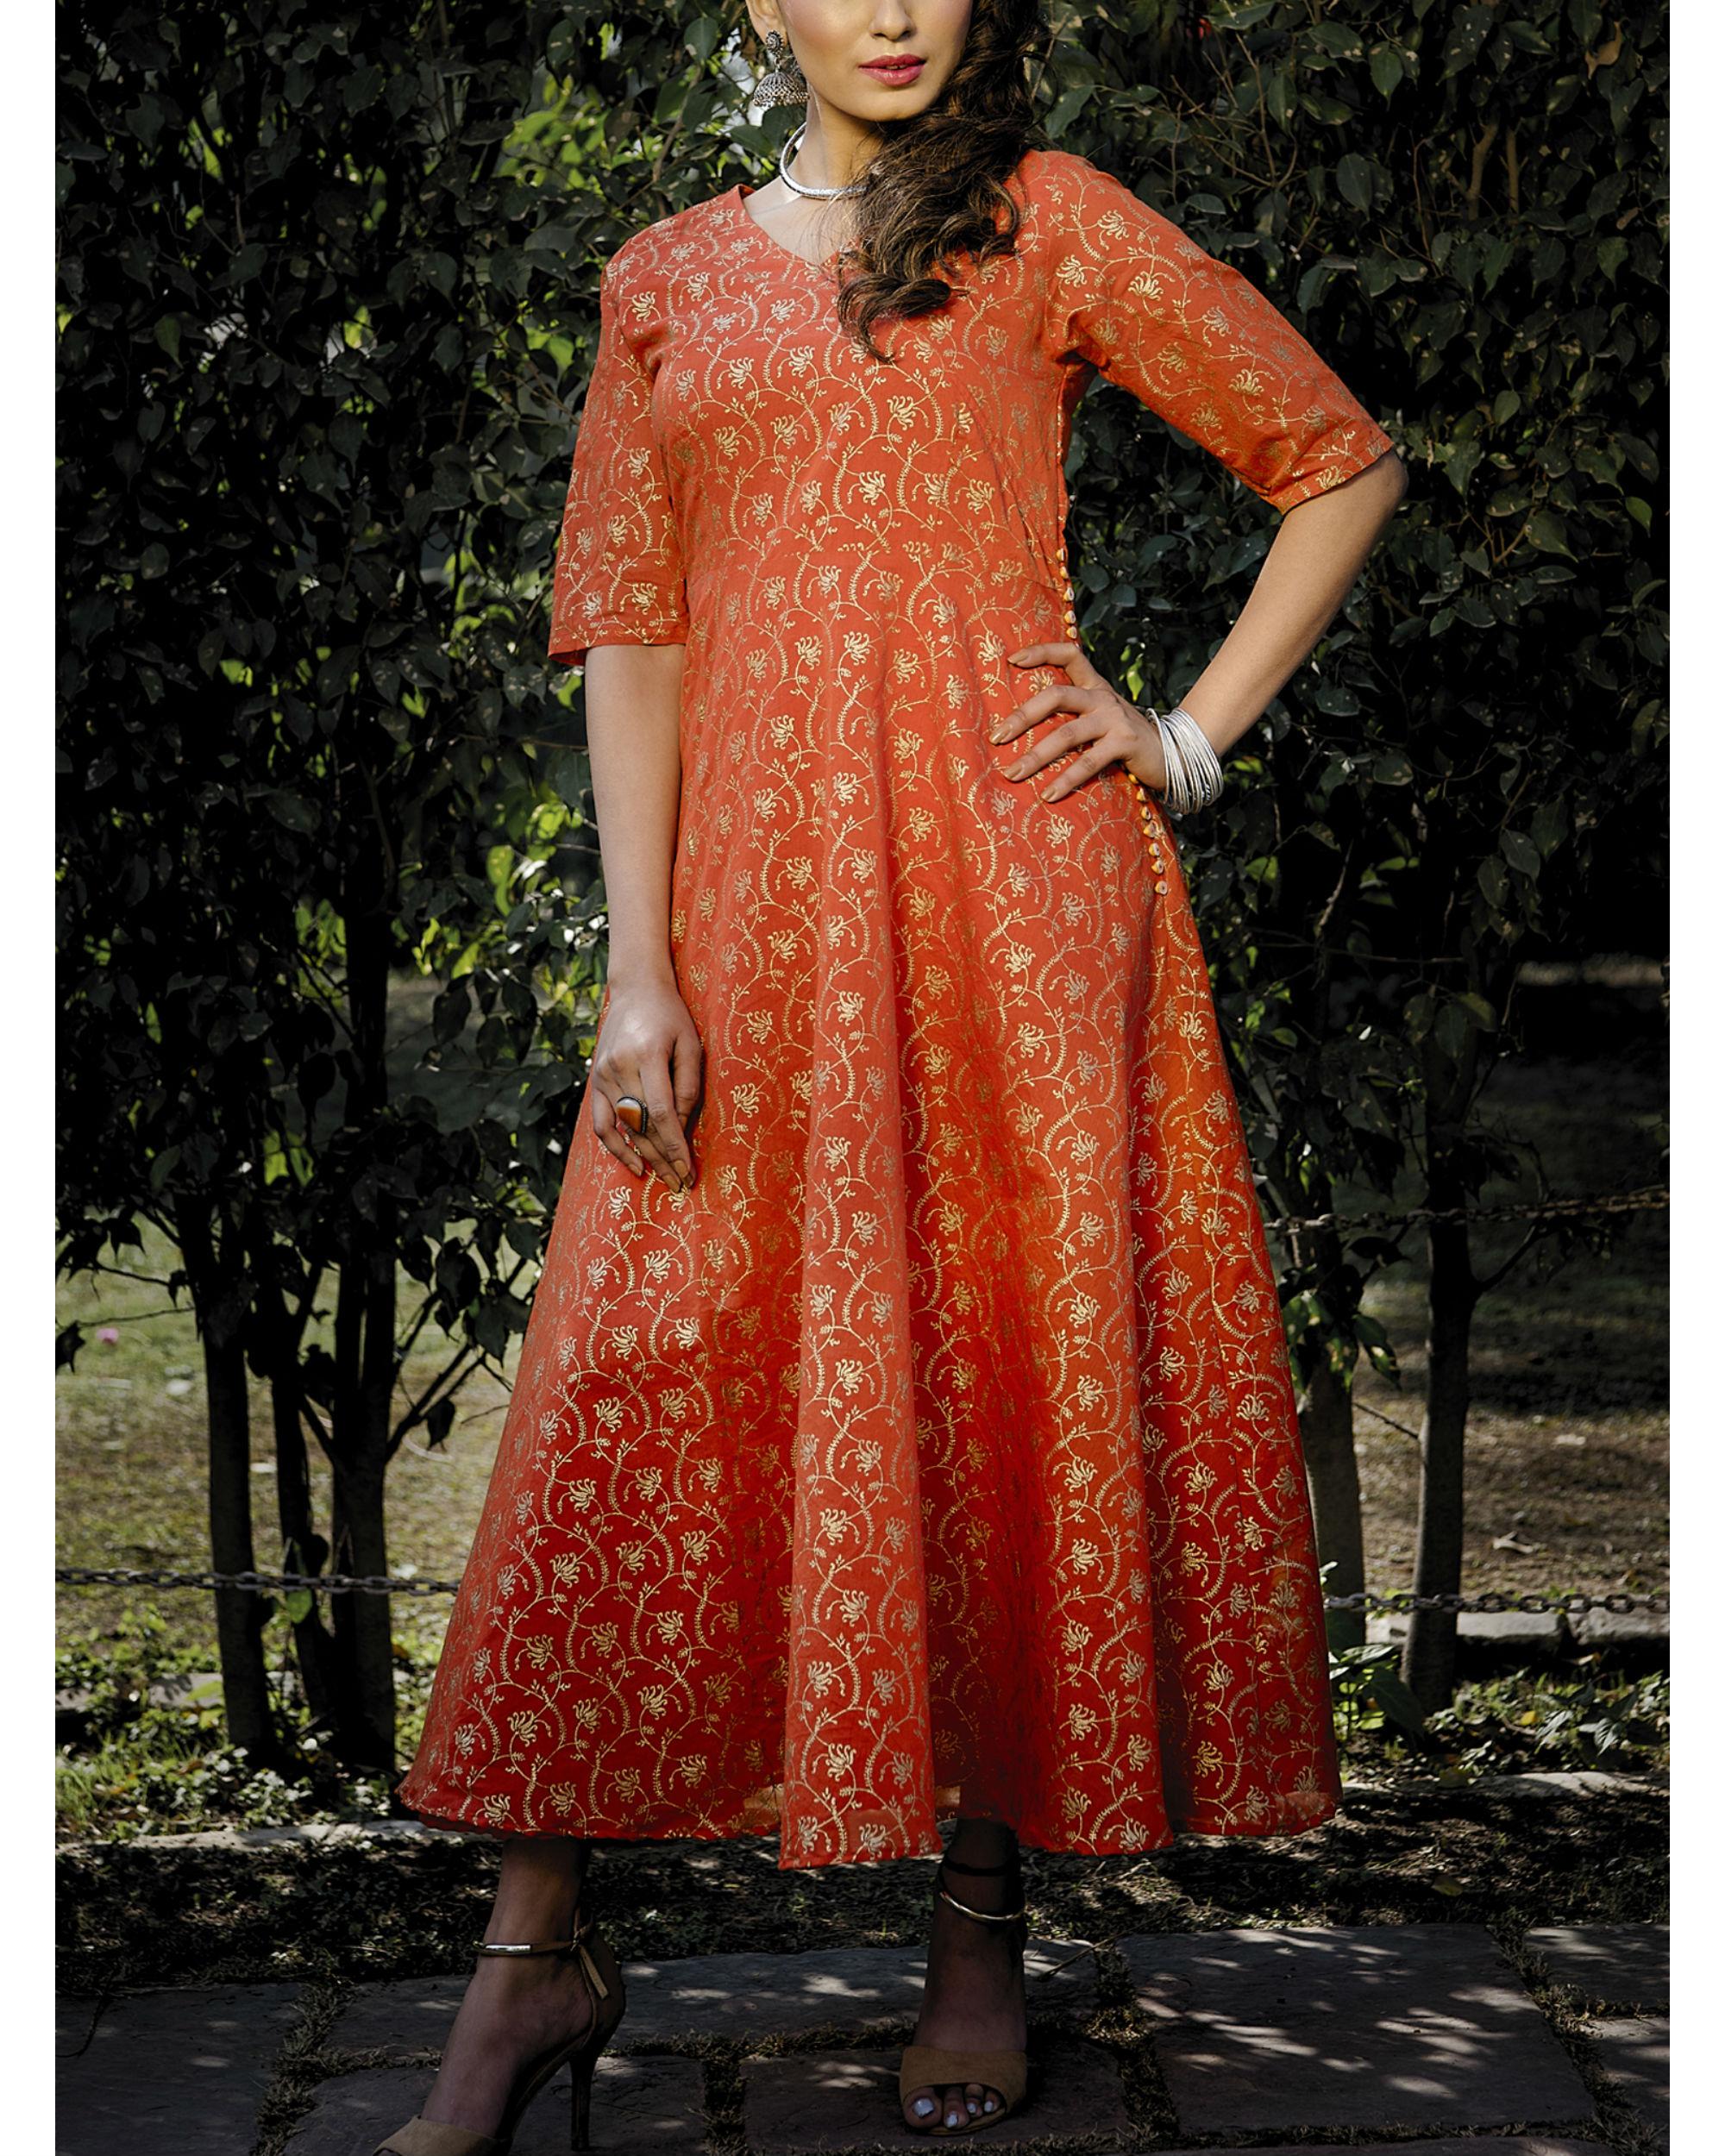 Arjama chanderi dress